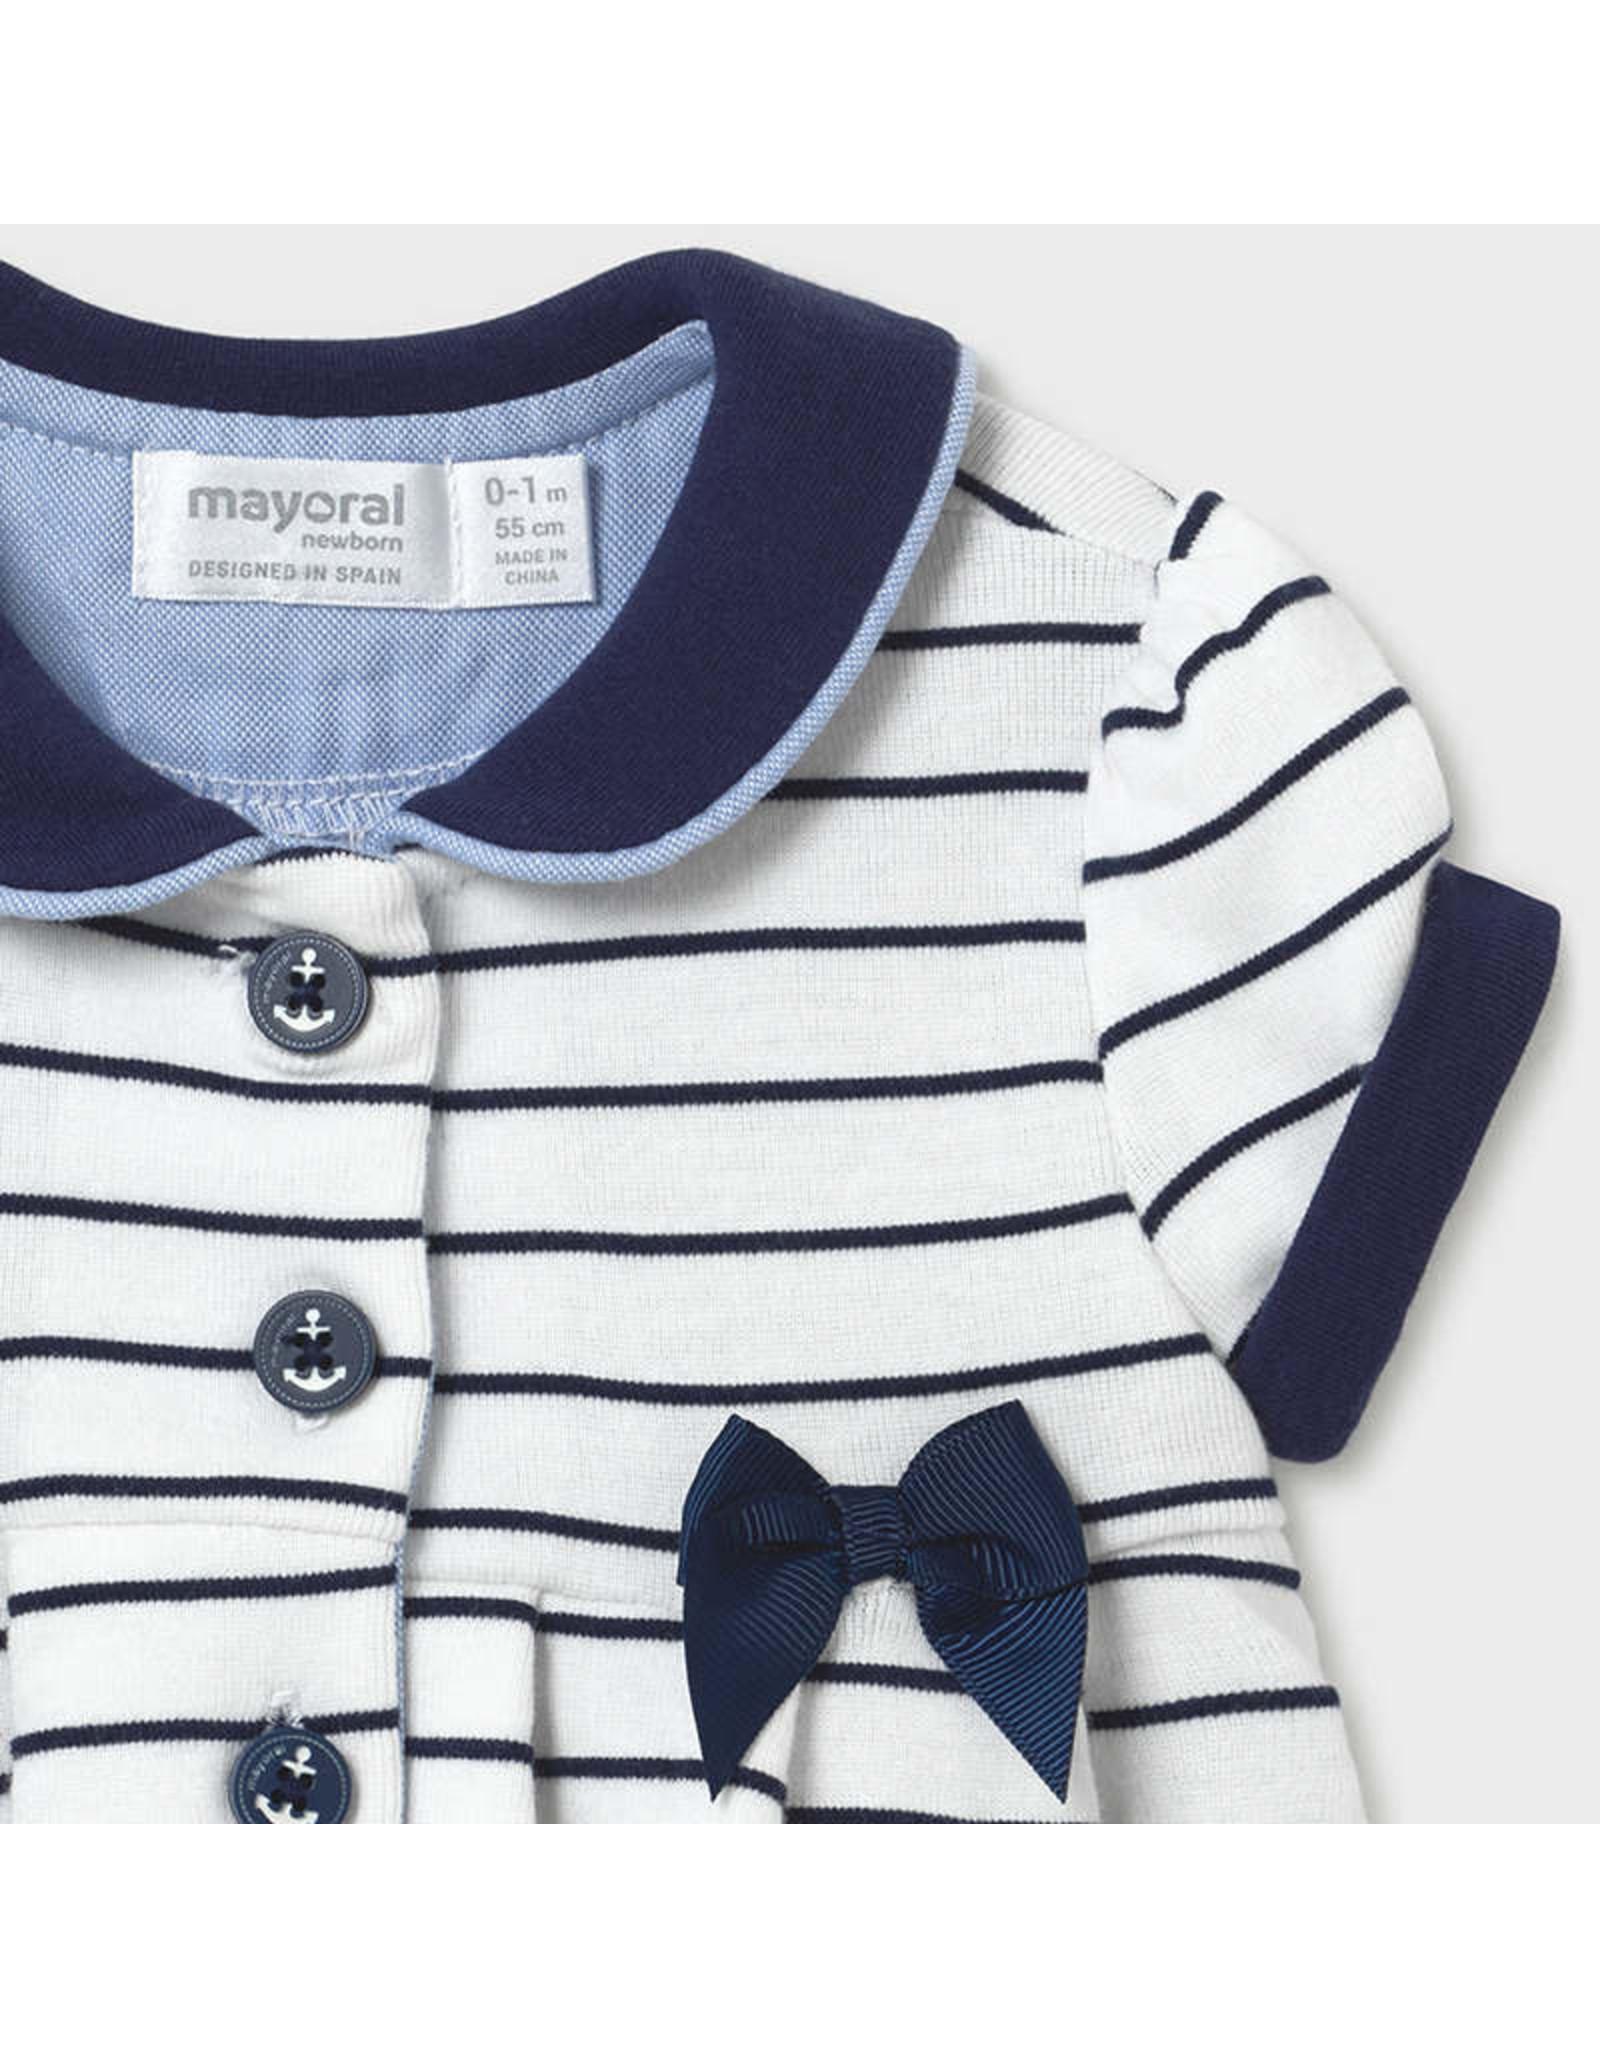 Mayoral Navy dress